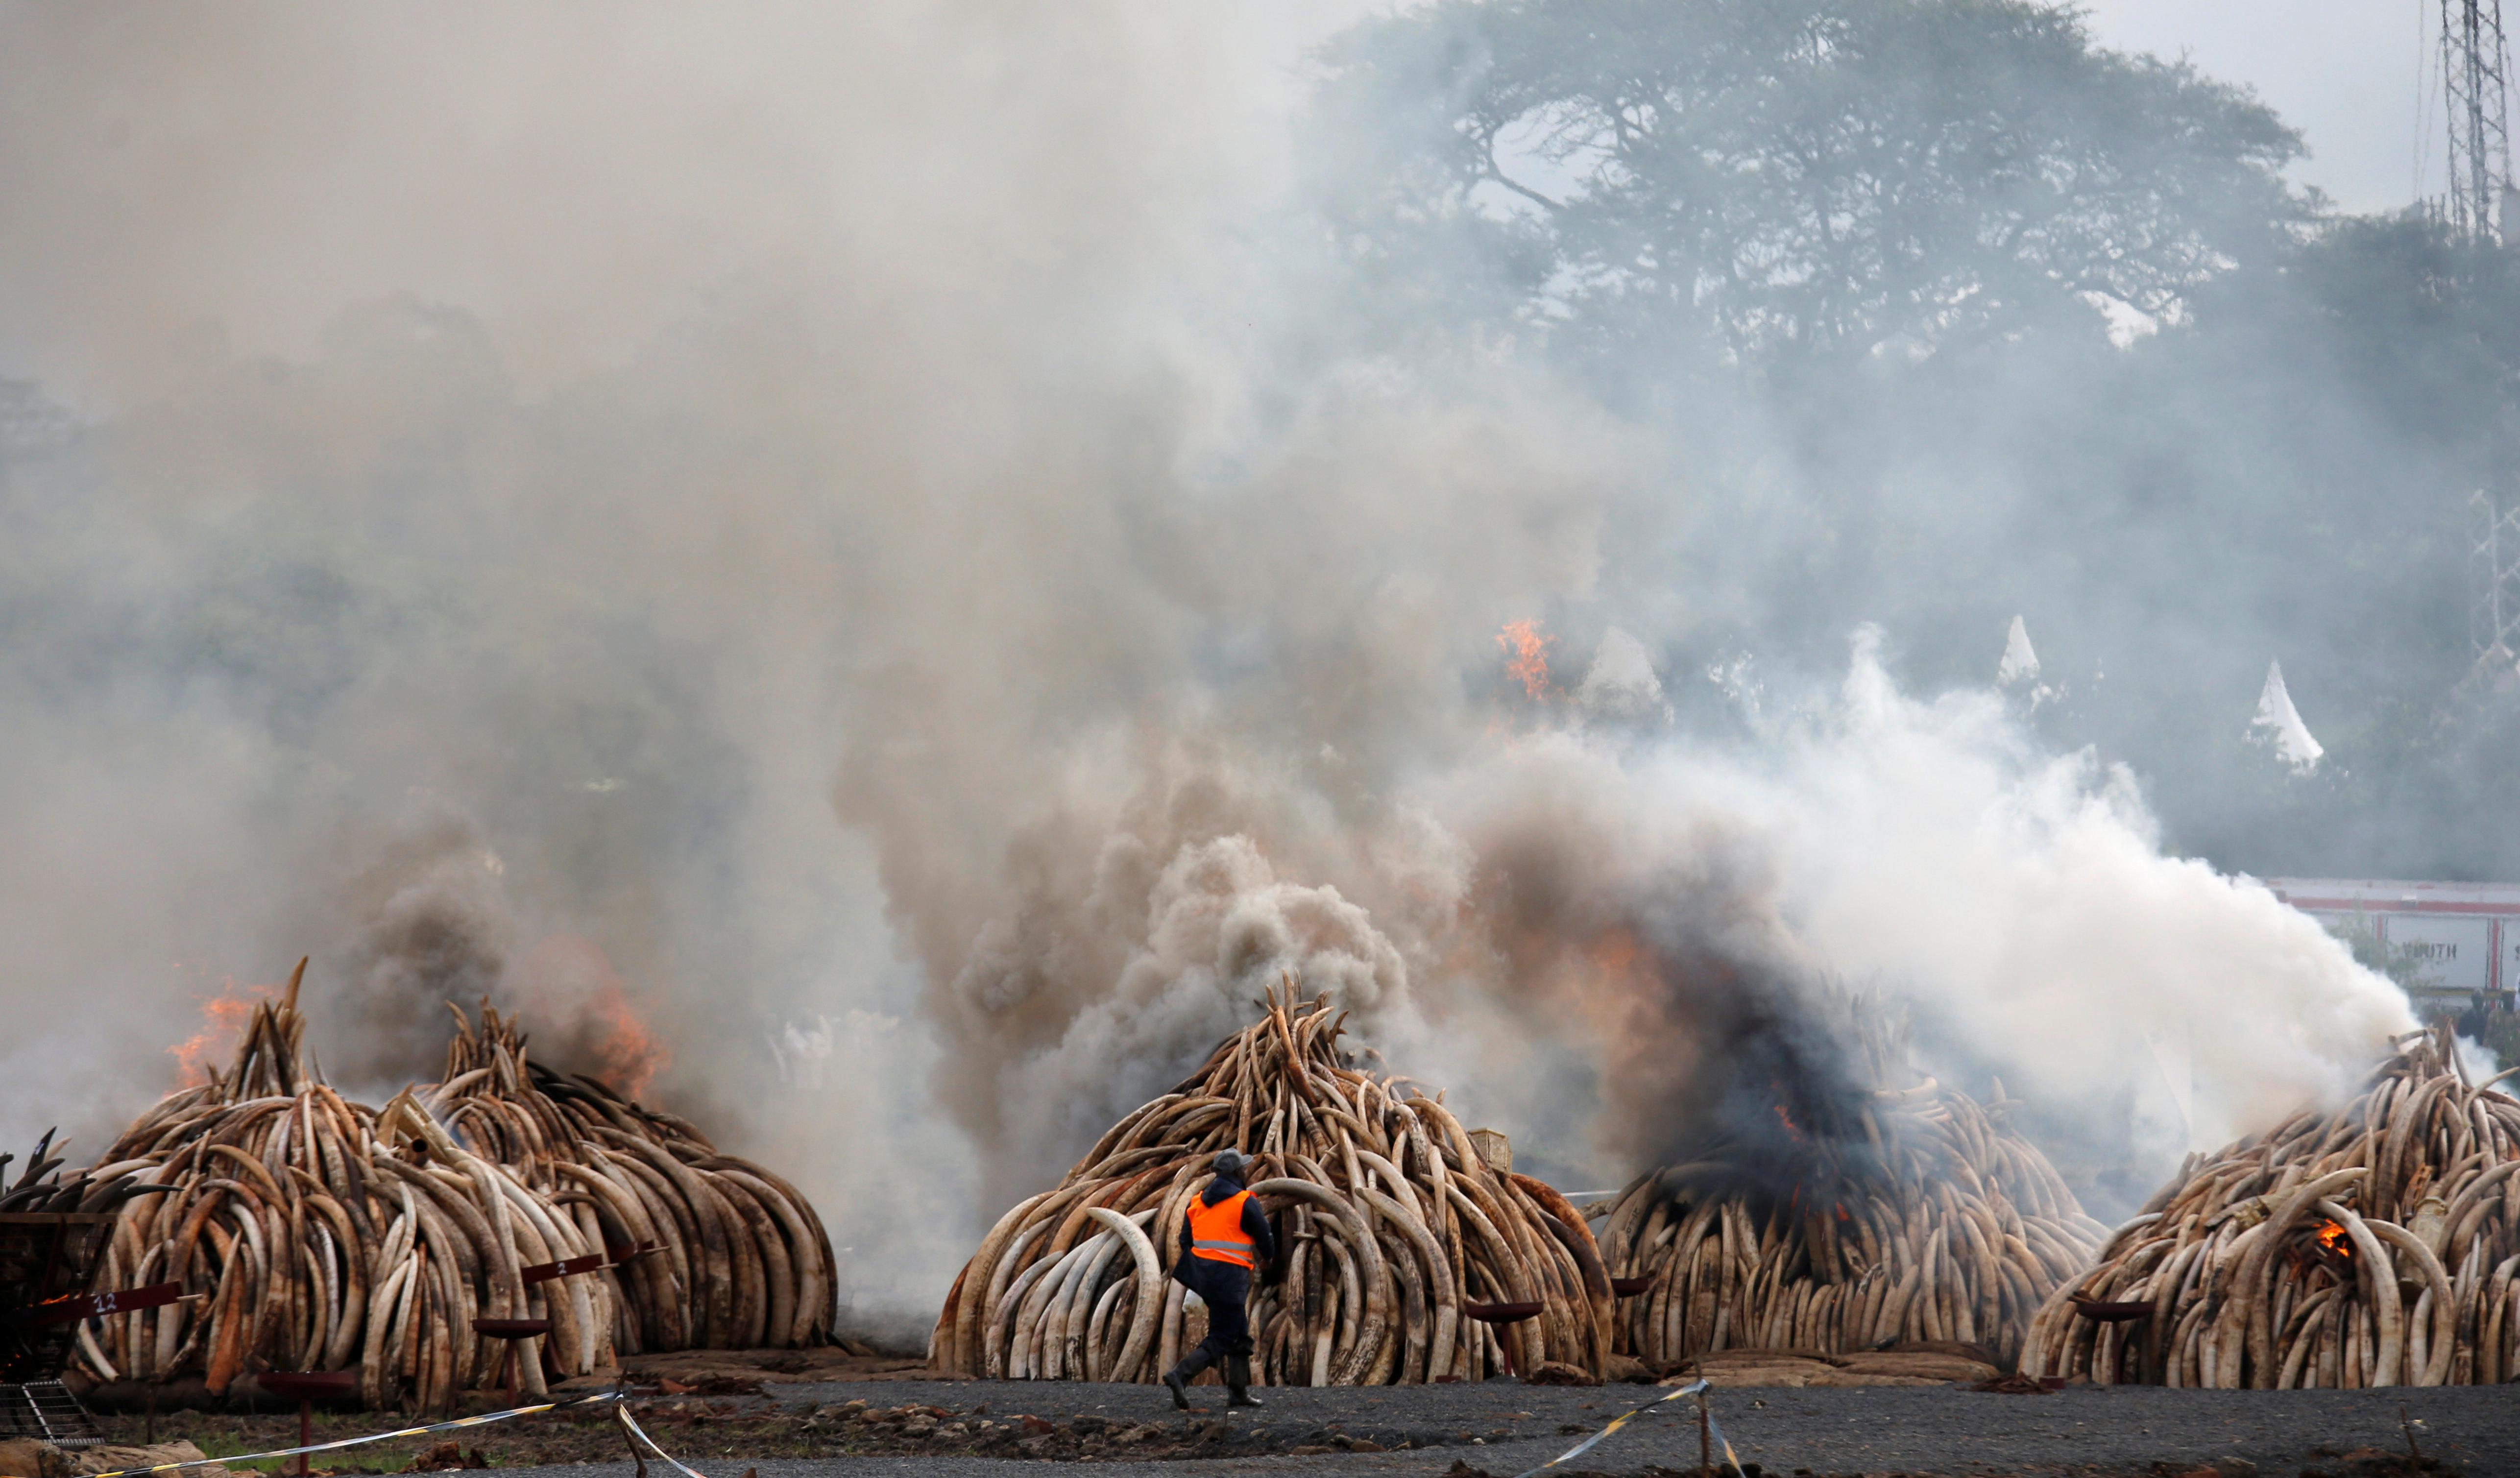 A fire expert monitors the burning of confiscated ivory from smugglers and poachers, at the Nairobi National Park near Nairobi, Kenya, April 30, 2016. REUTERS/Thomas Mukoya